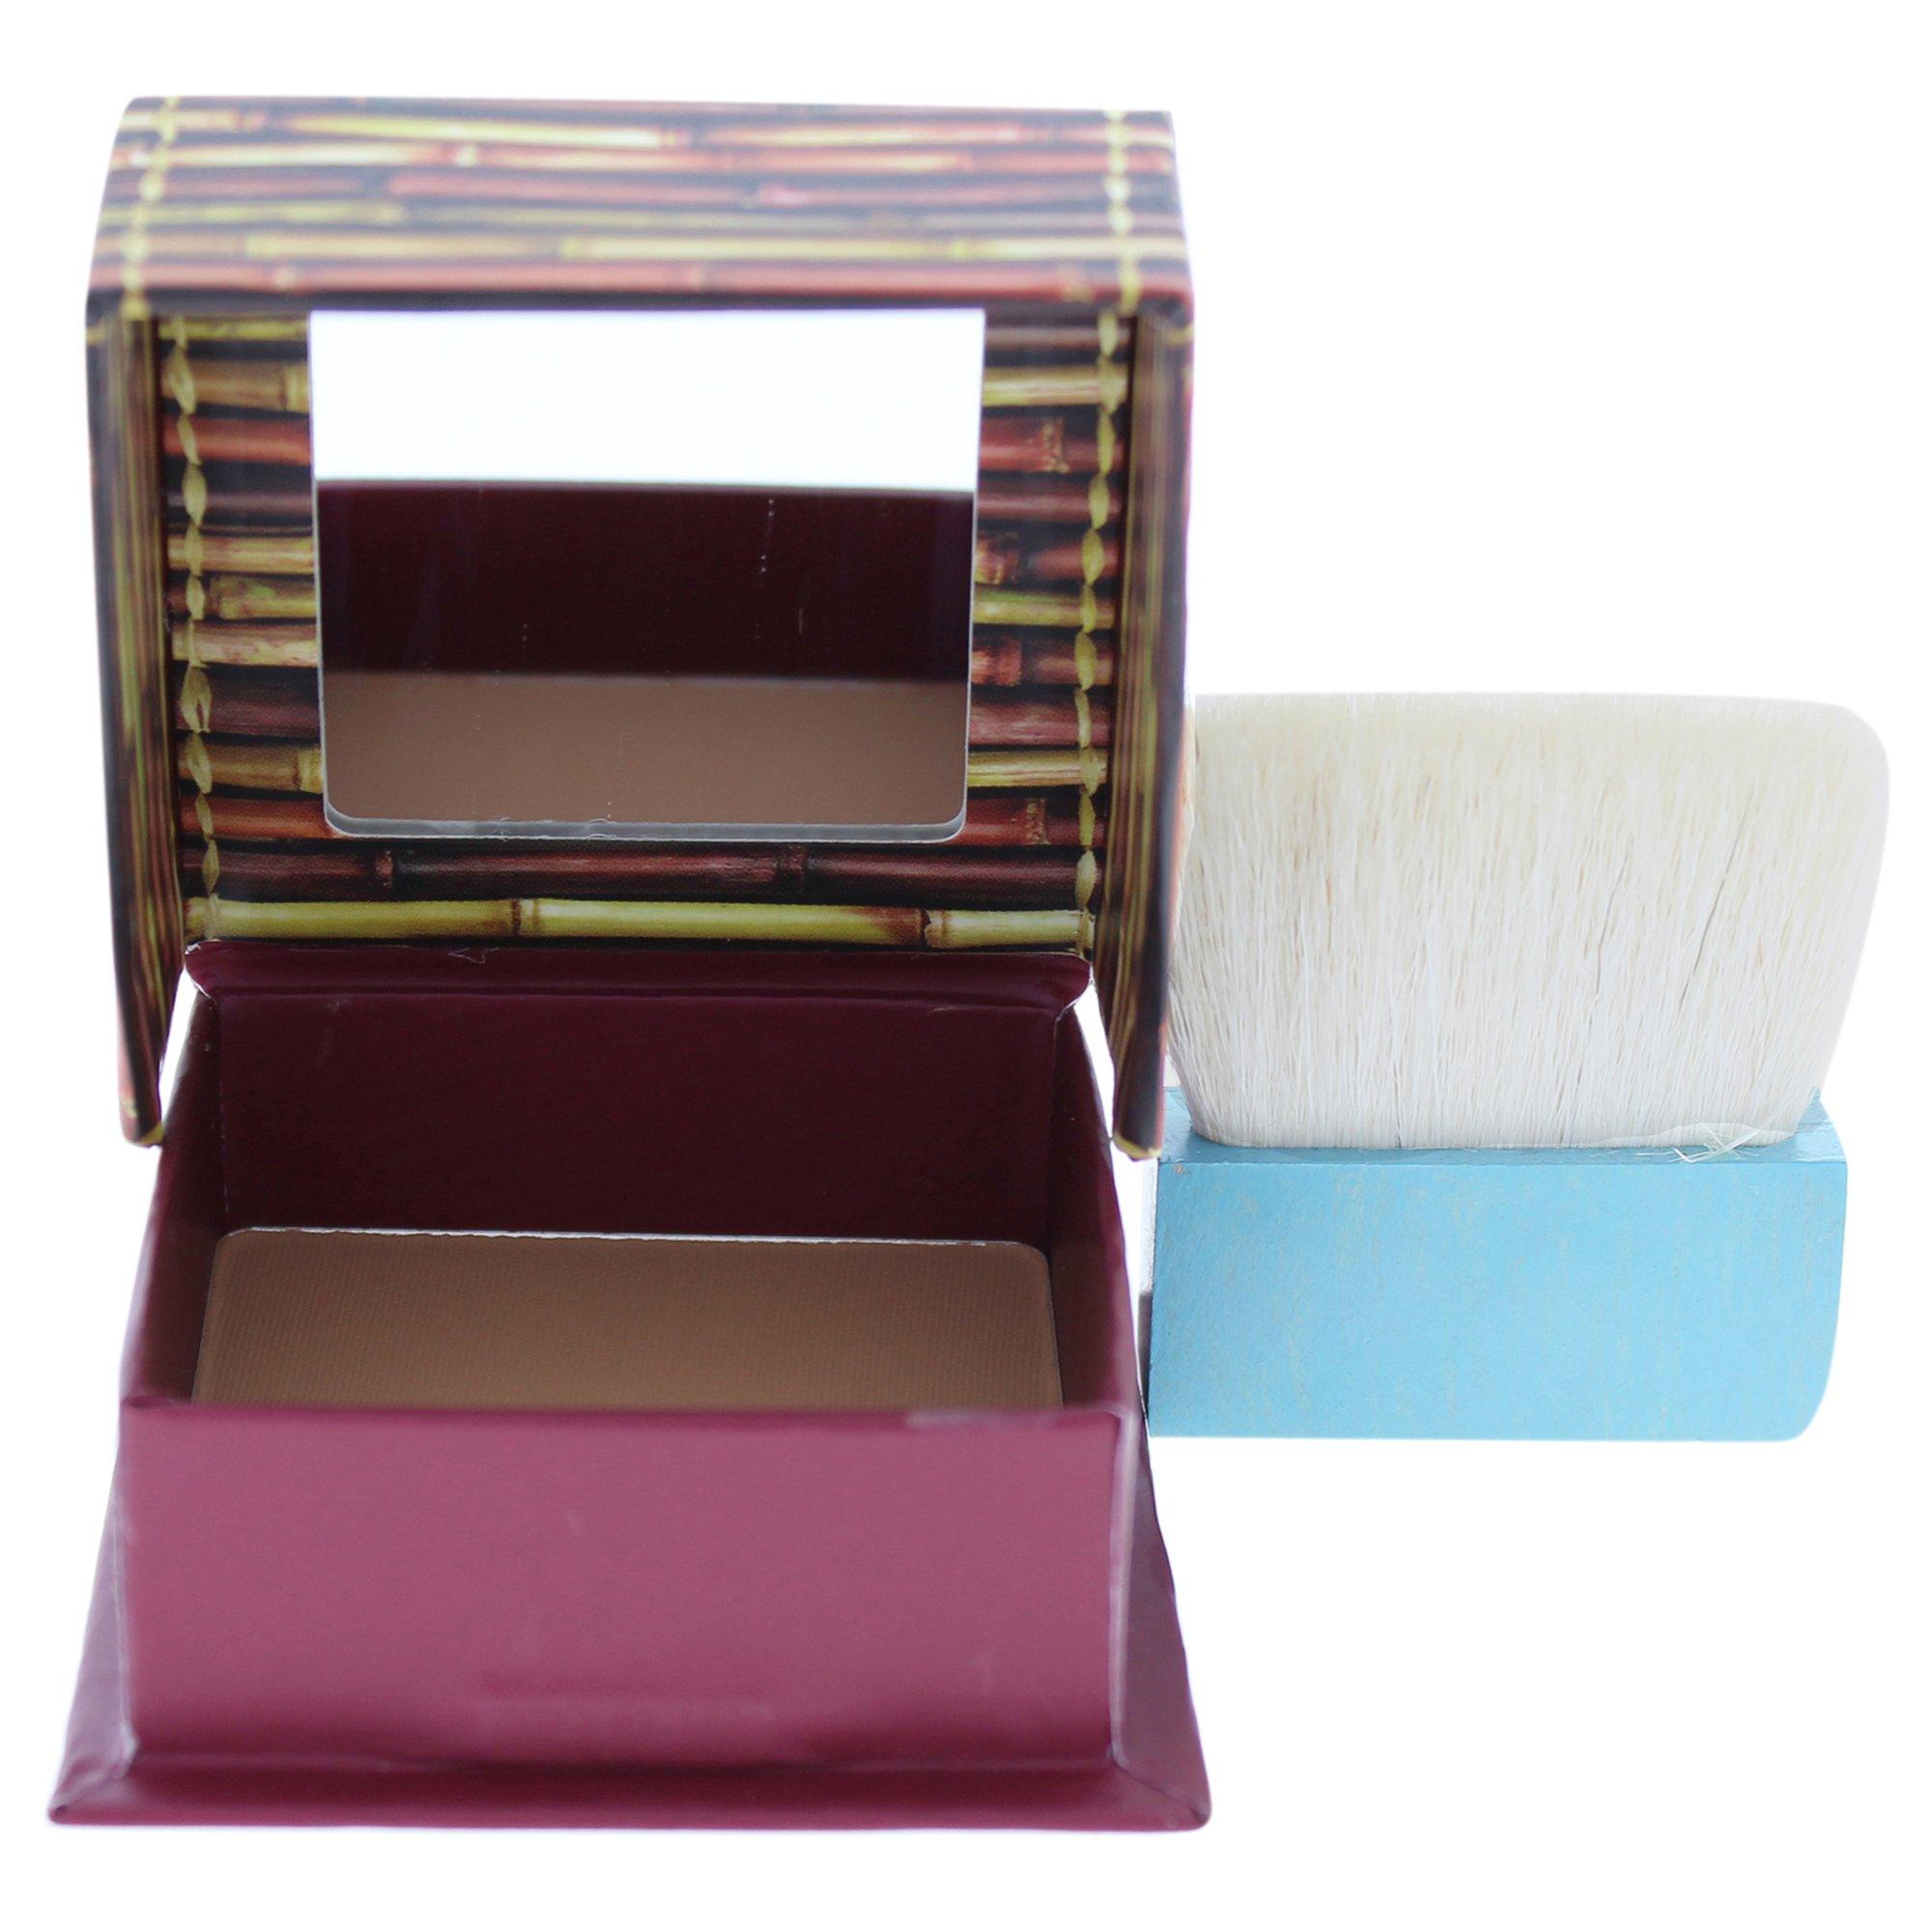 Benefit Cosmetics Hoola Bronzing Powder 0.28 Ounces by Benefit Cosmetics